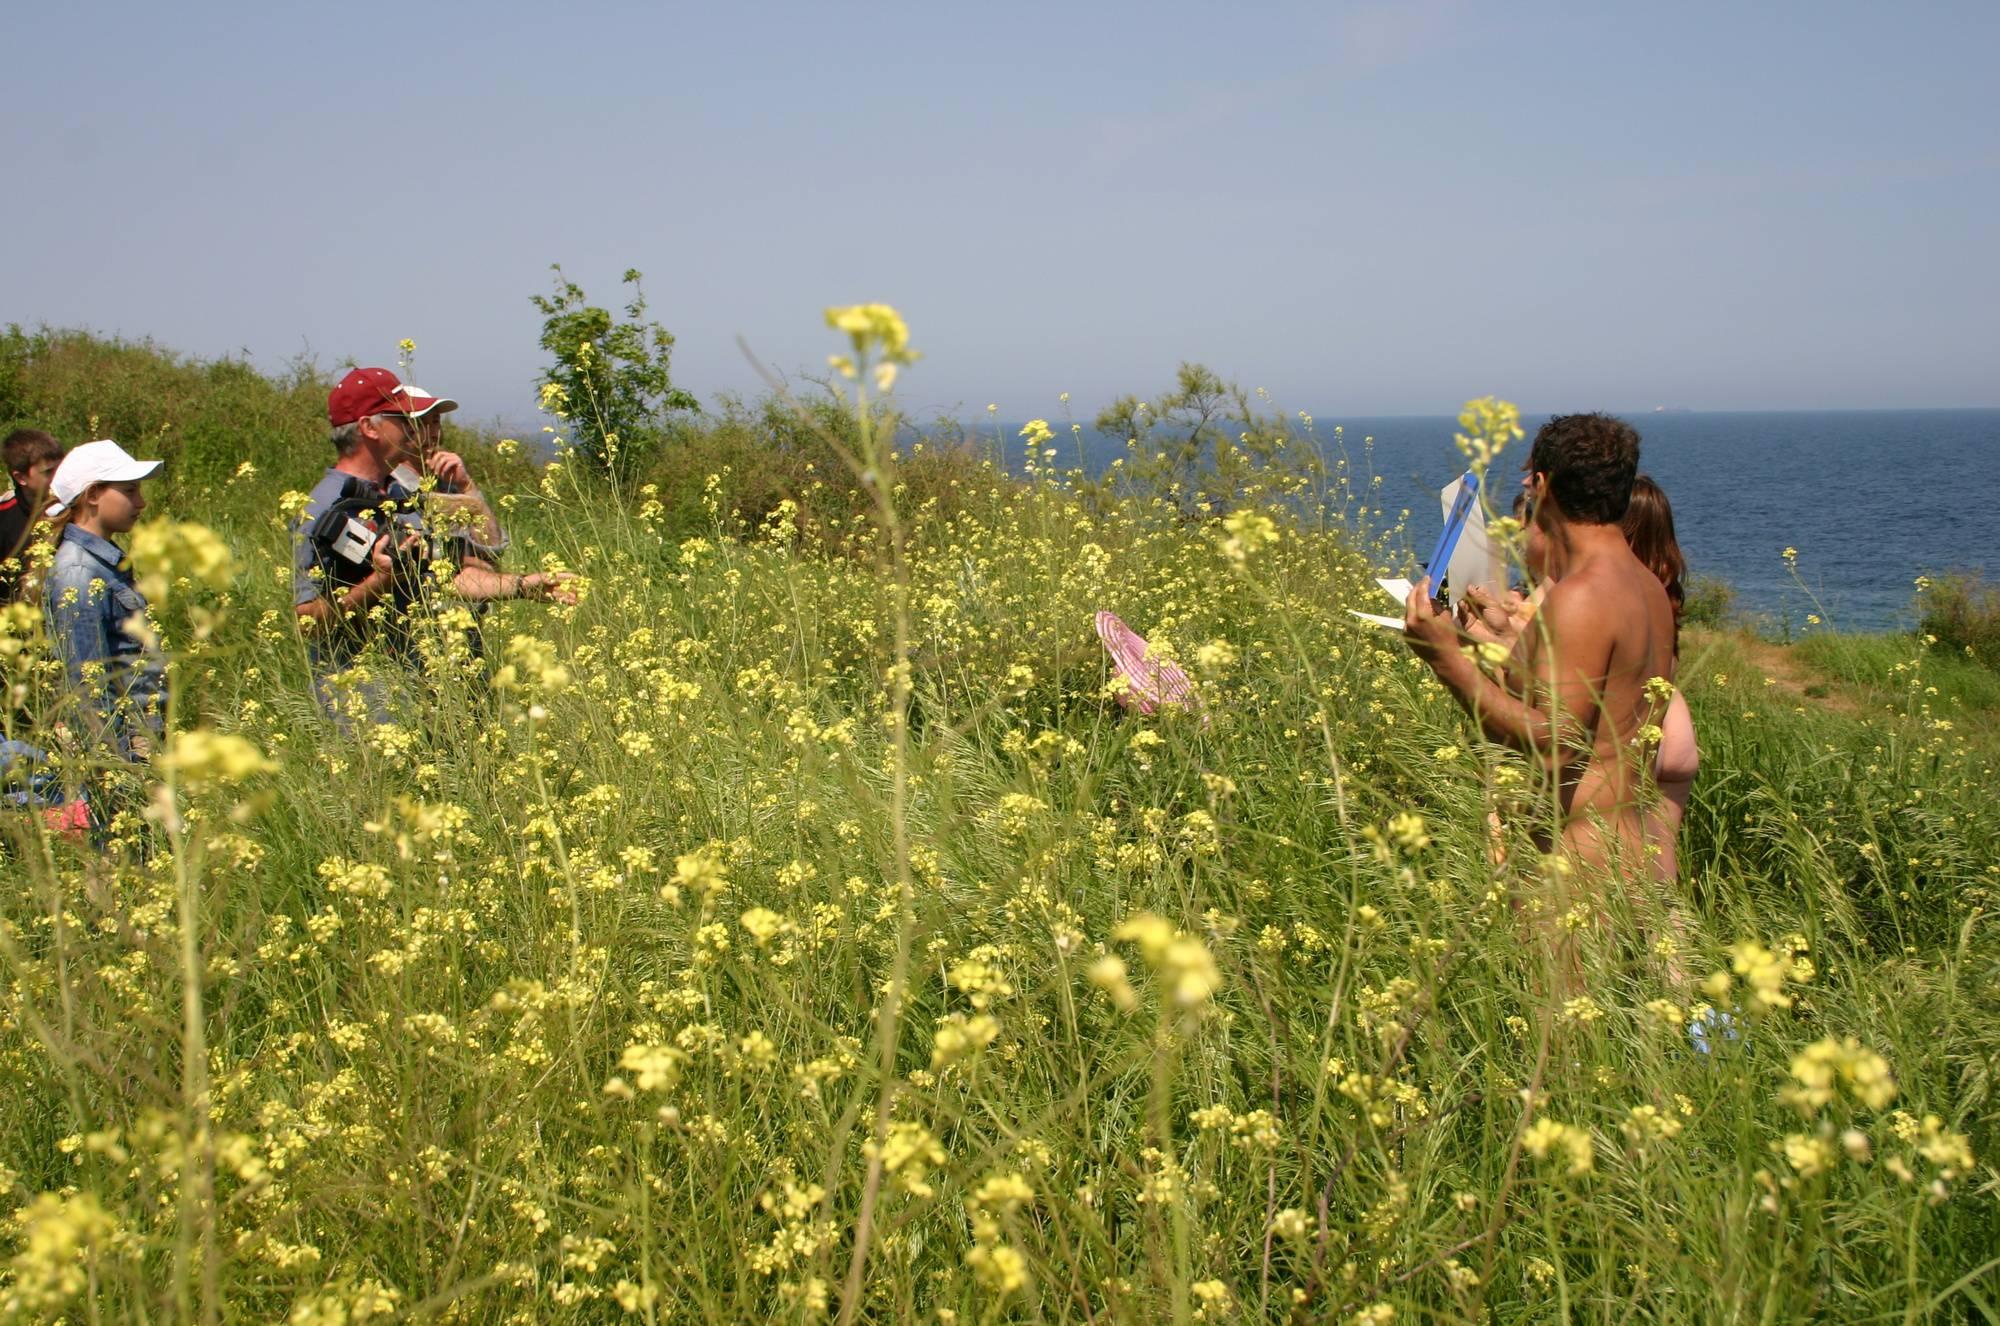 Nudist Pics Colored Naturist Letters - 1